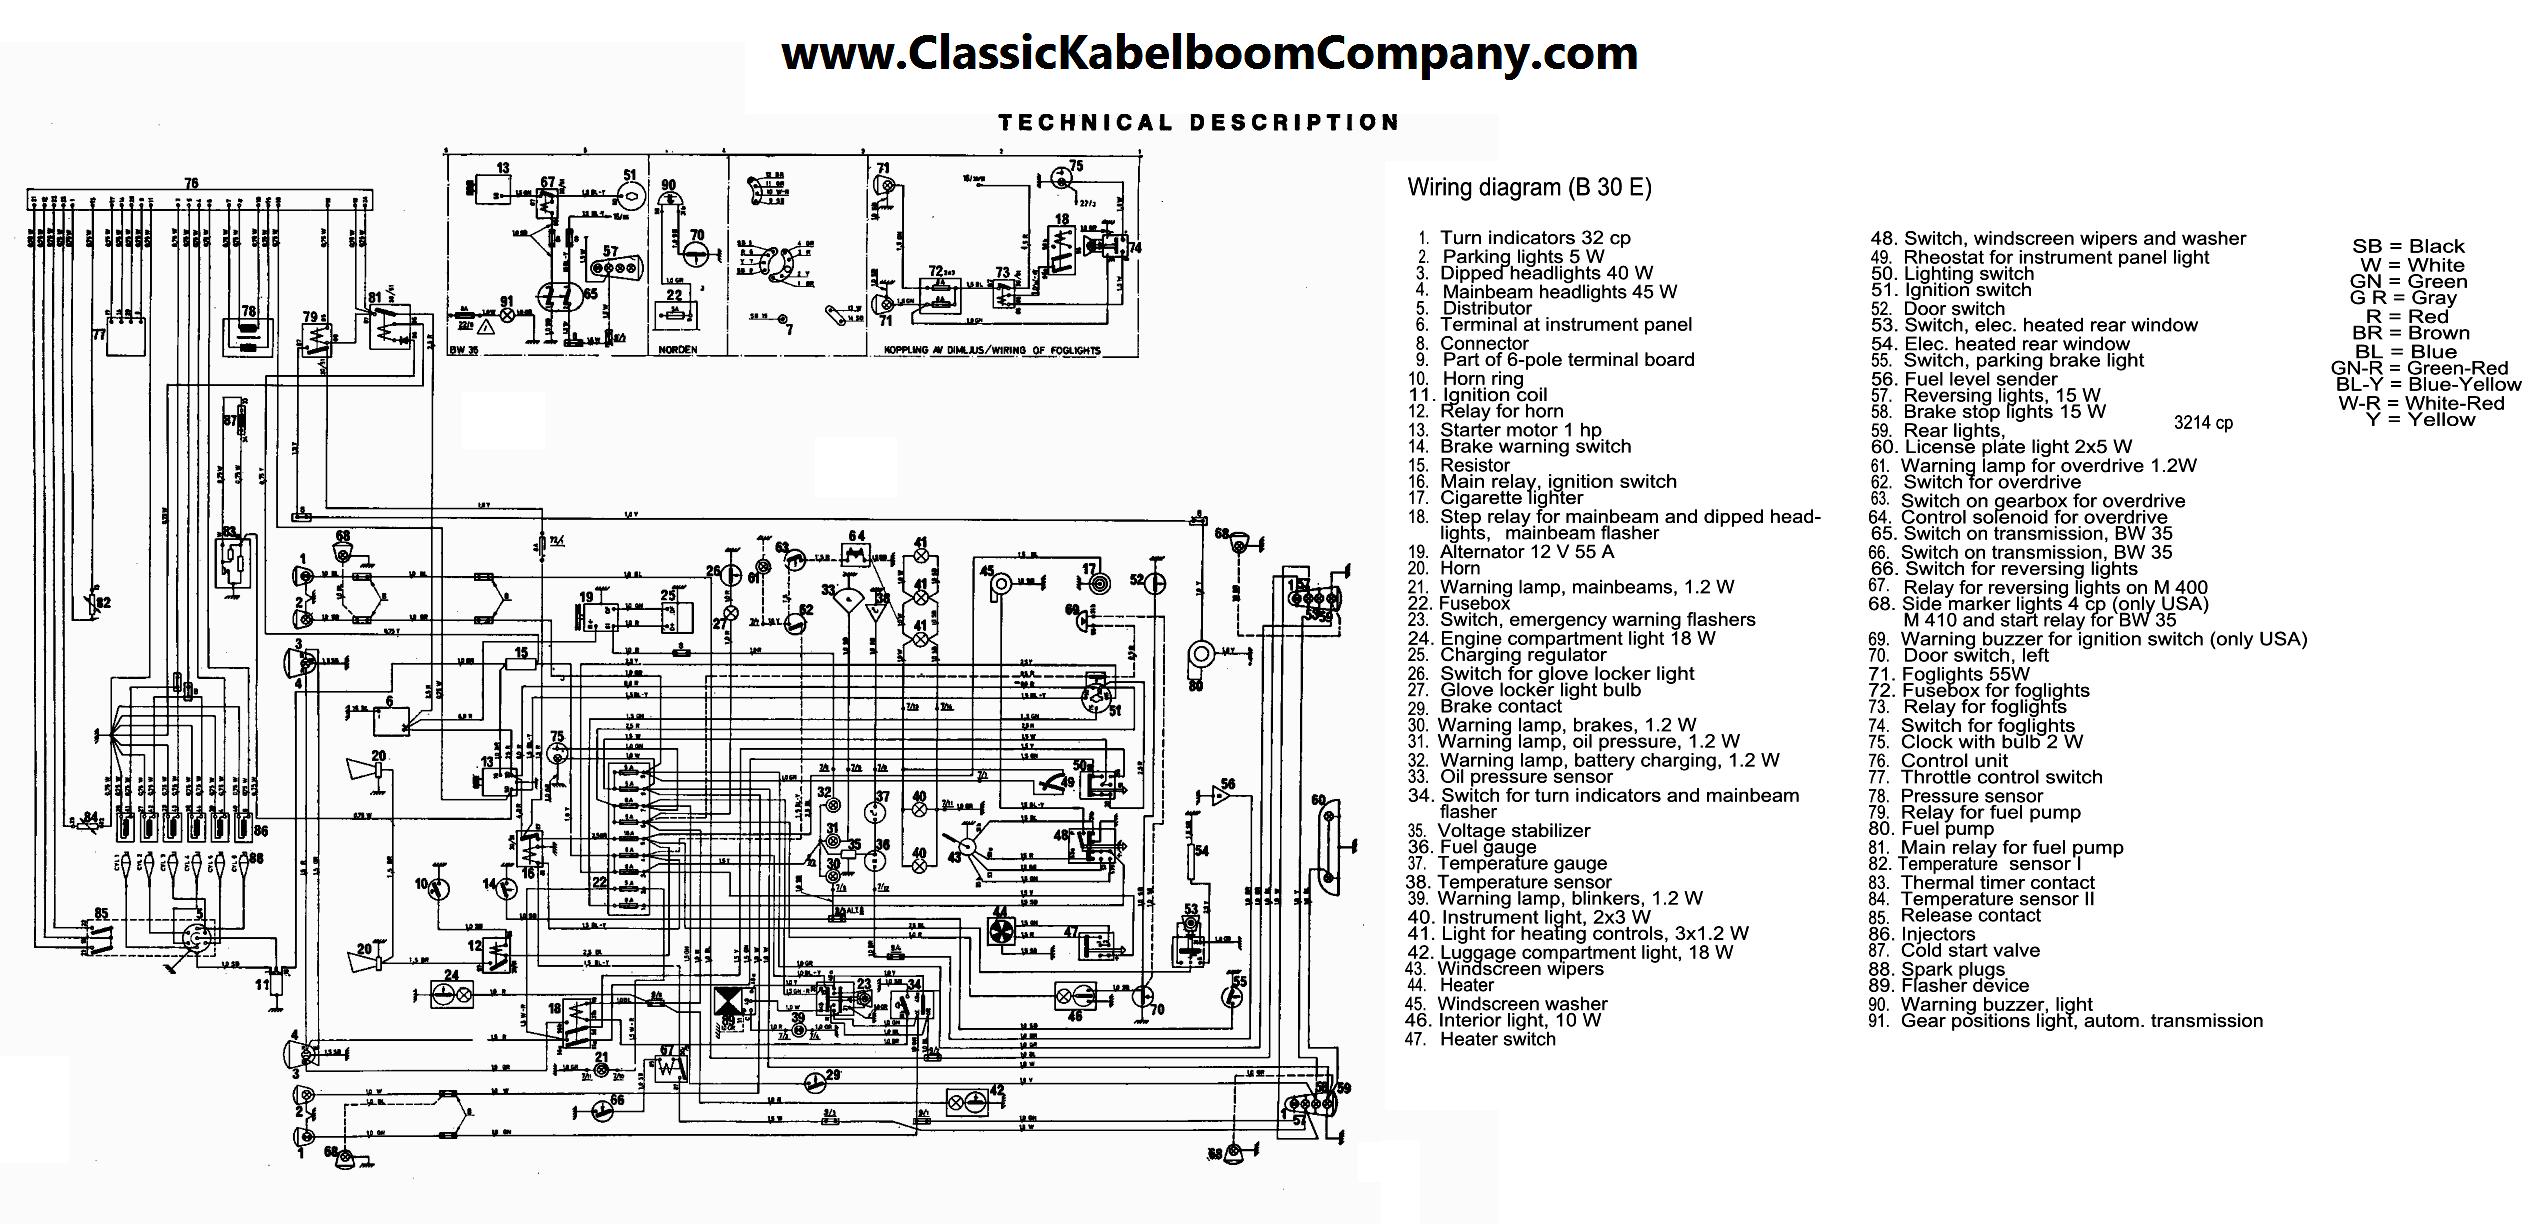 Wiring Diagram For 1973 Volvo 1800 Es Classic Kabelboom Company Elektrisch Bedrading Schema